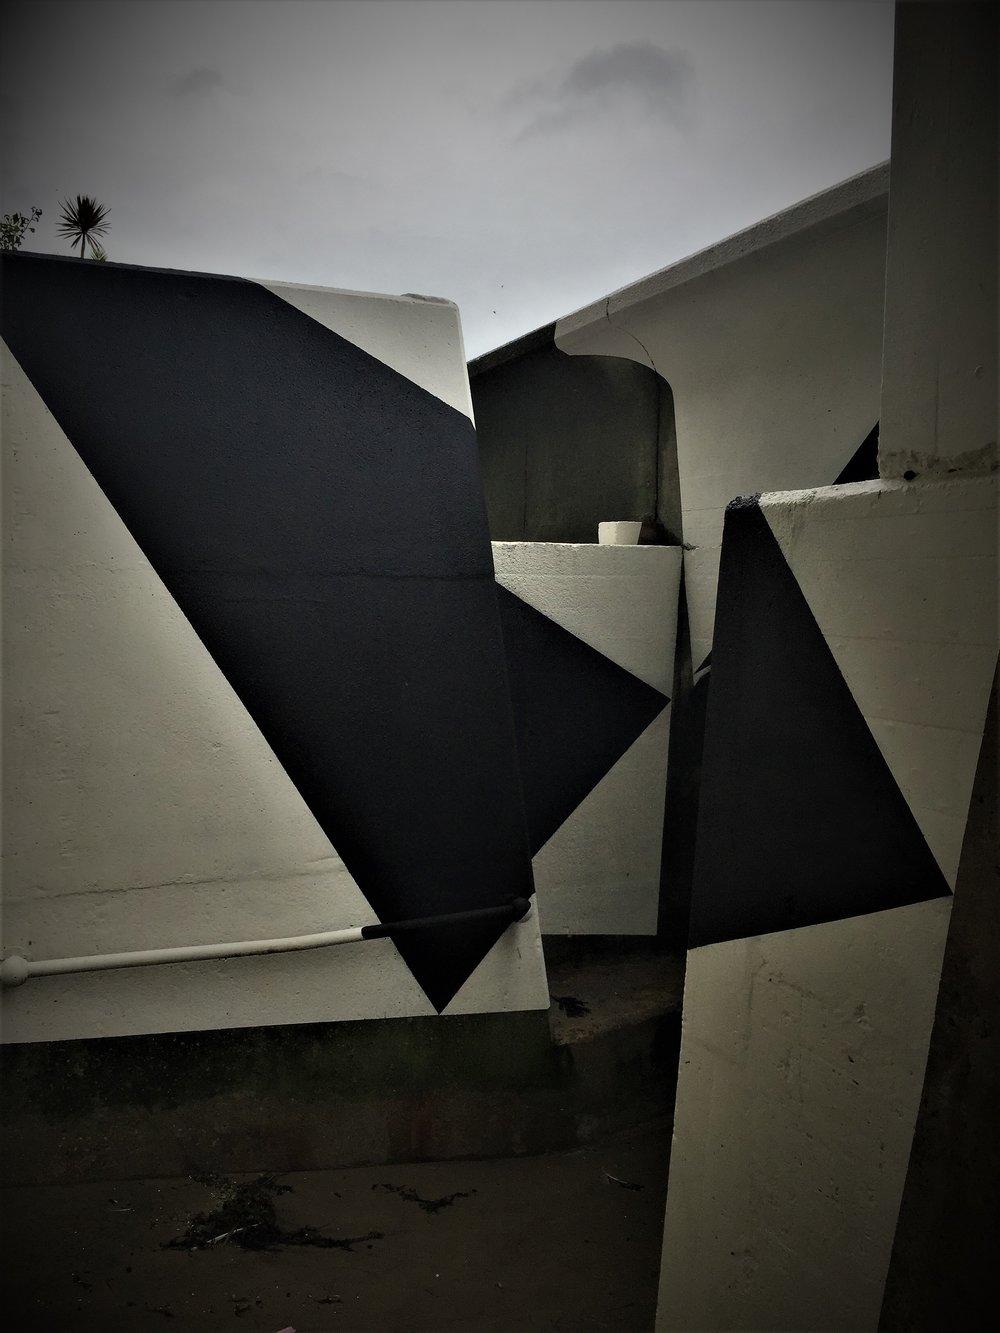 Folkestone Triennal Art - Gary Woodley, Impingement No. 66 'Cube Circumscribed by Tetrahedron